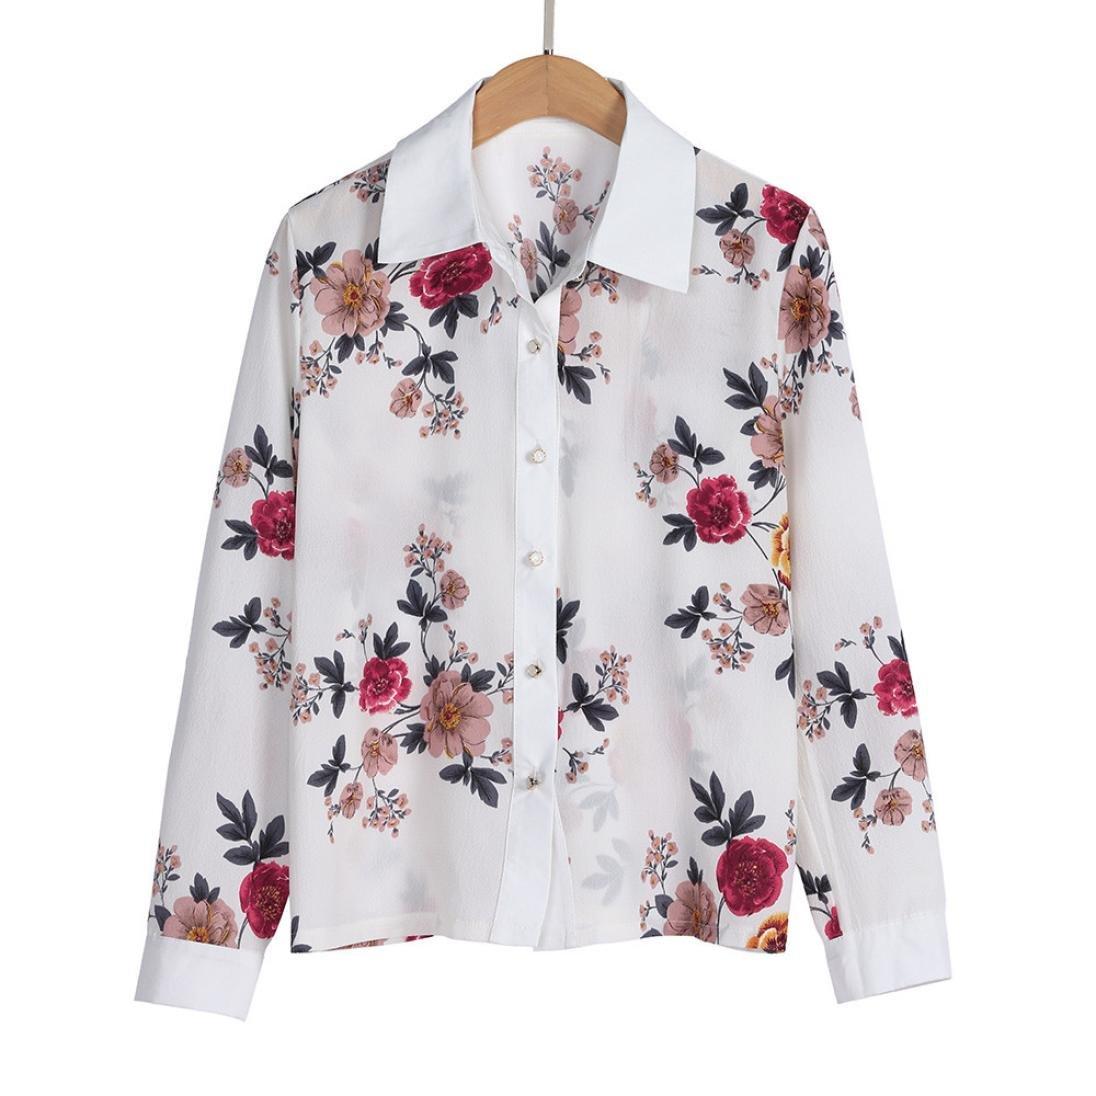 55c3bc85336 Sannysis Floral Tops for Women Print Chiffon Sexy White Blouses Long Sleeve  Casual Tops Designer Blouse Hawaiian T-Shirt at Amazon Women's Clothing  store: